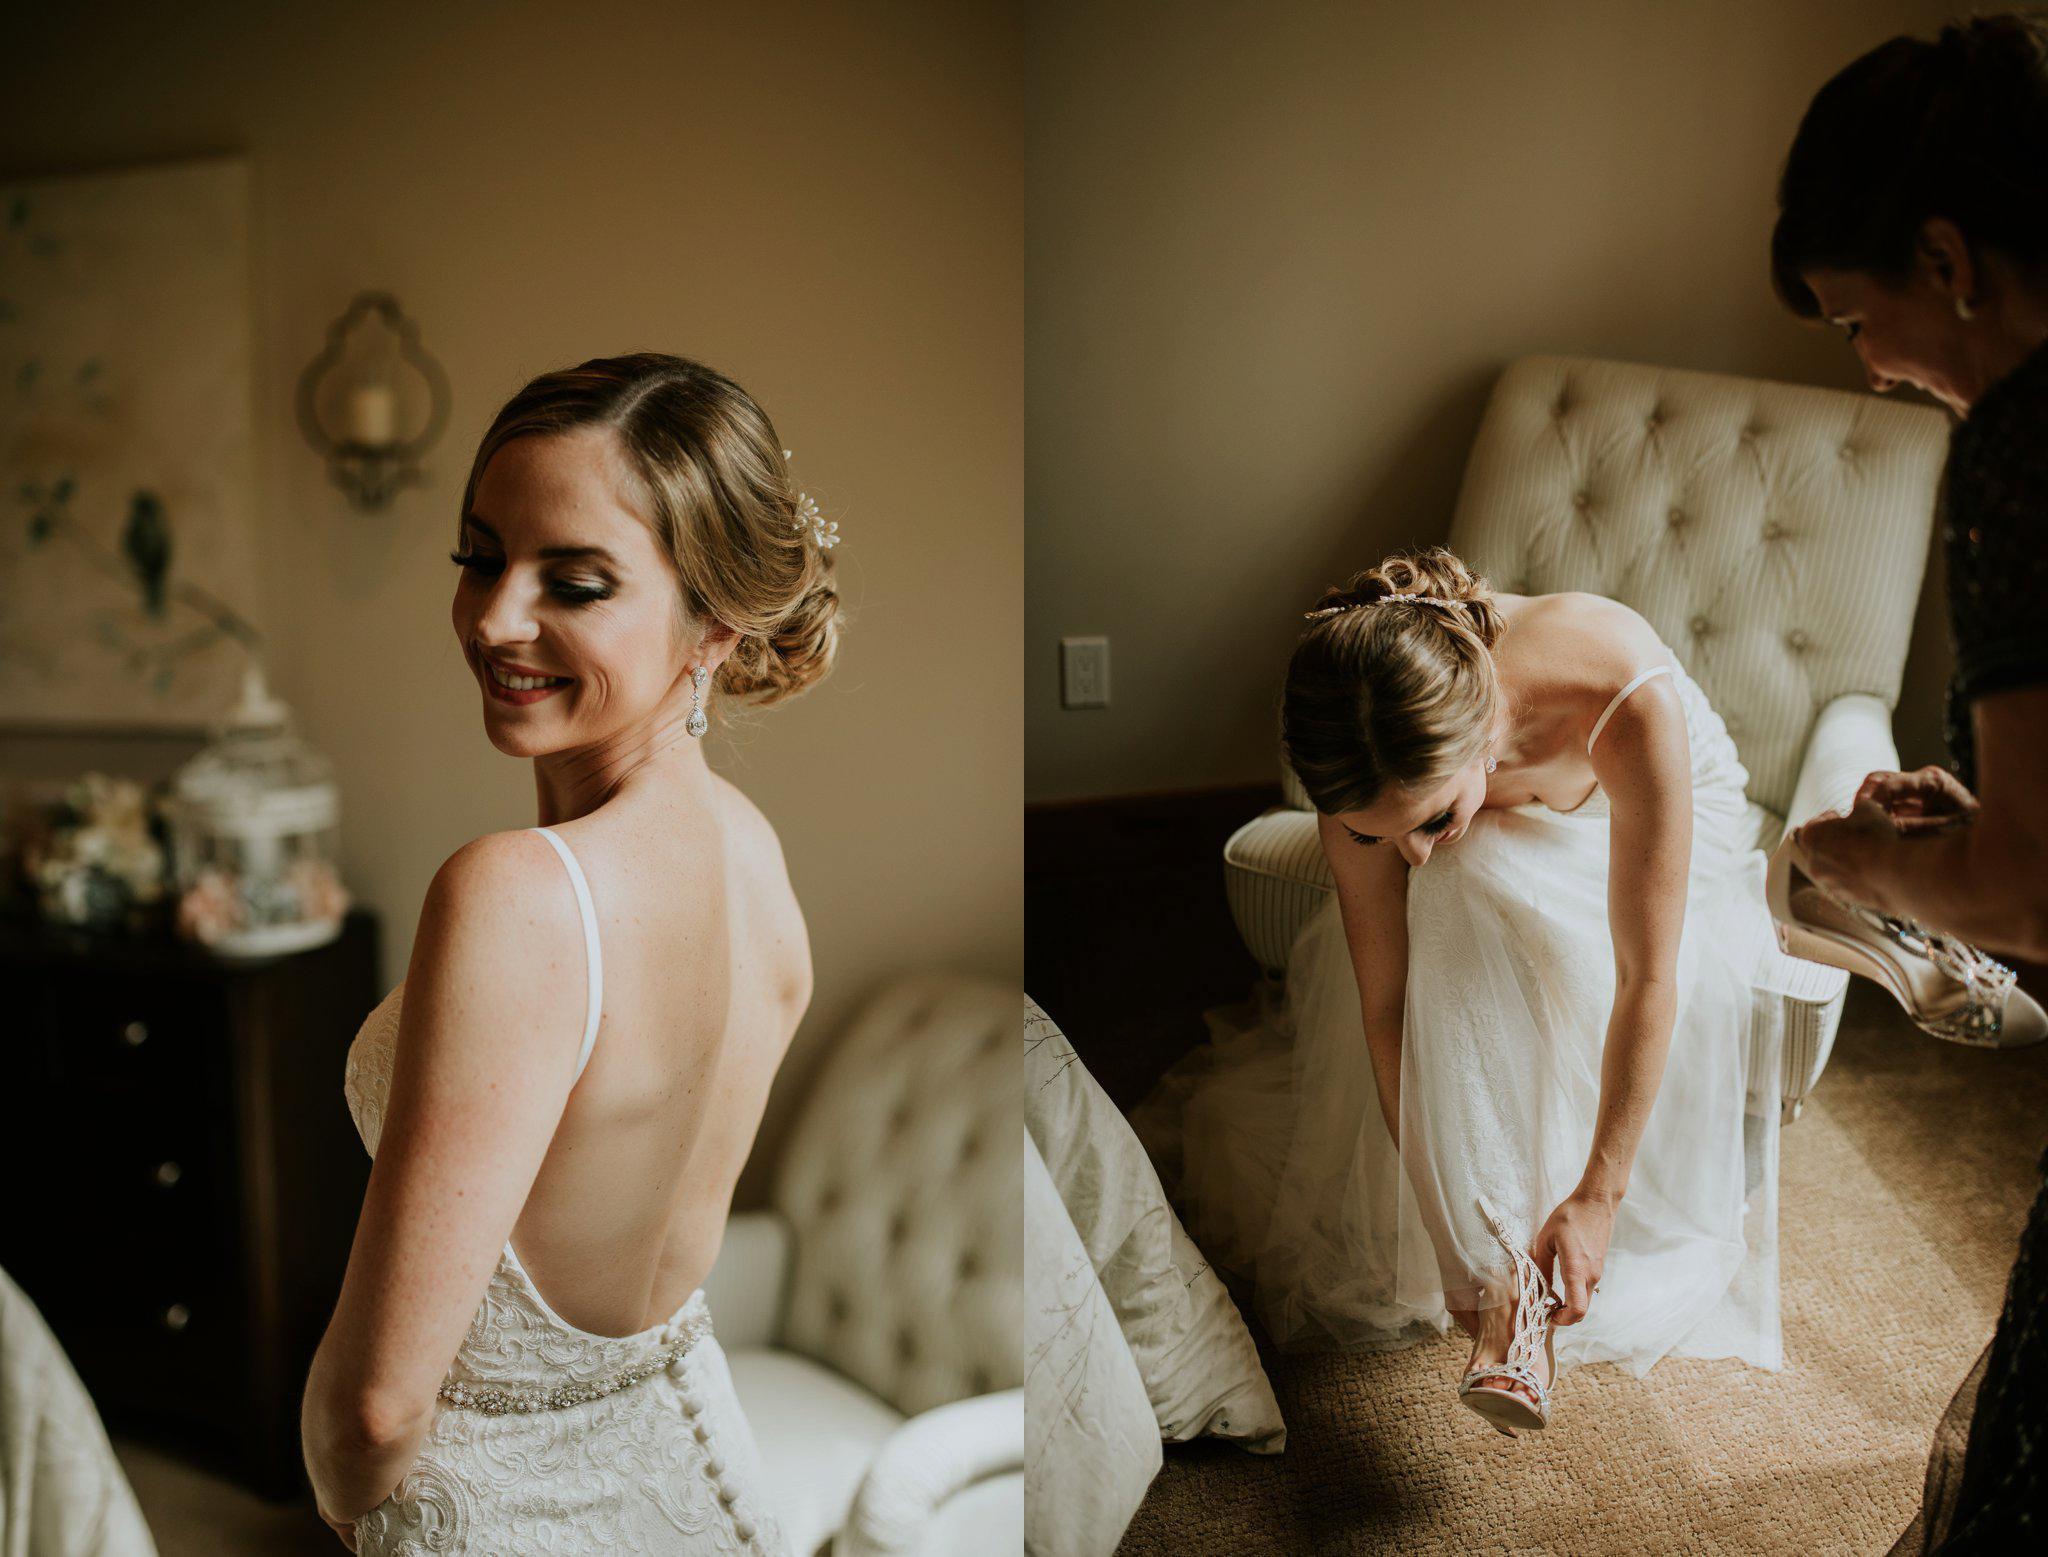 hollywood-school-house-wedding-seattle-photographer-caitlyn-nikula-21.jpg